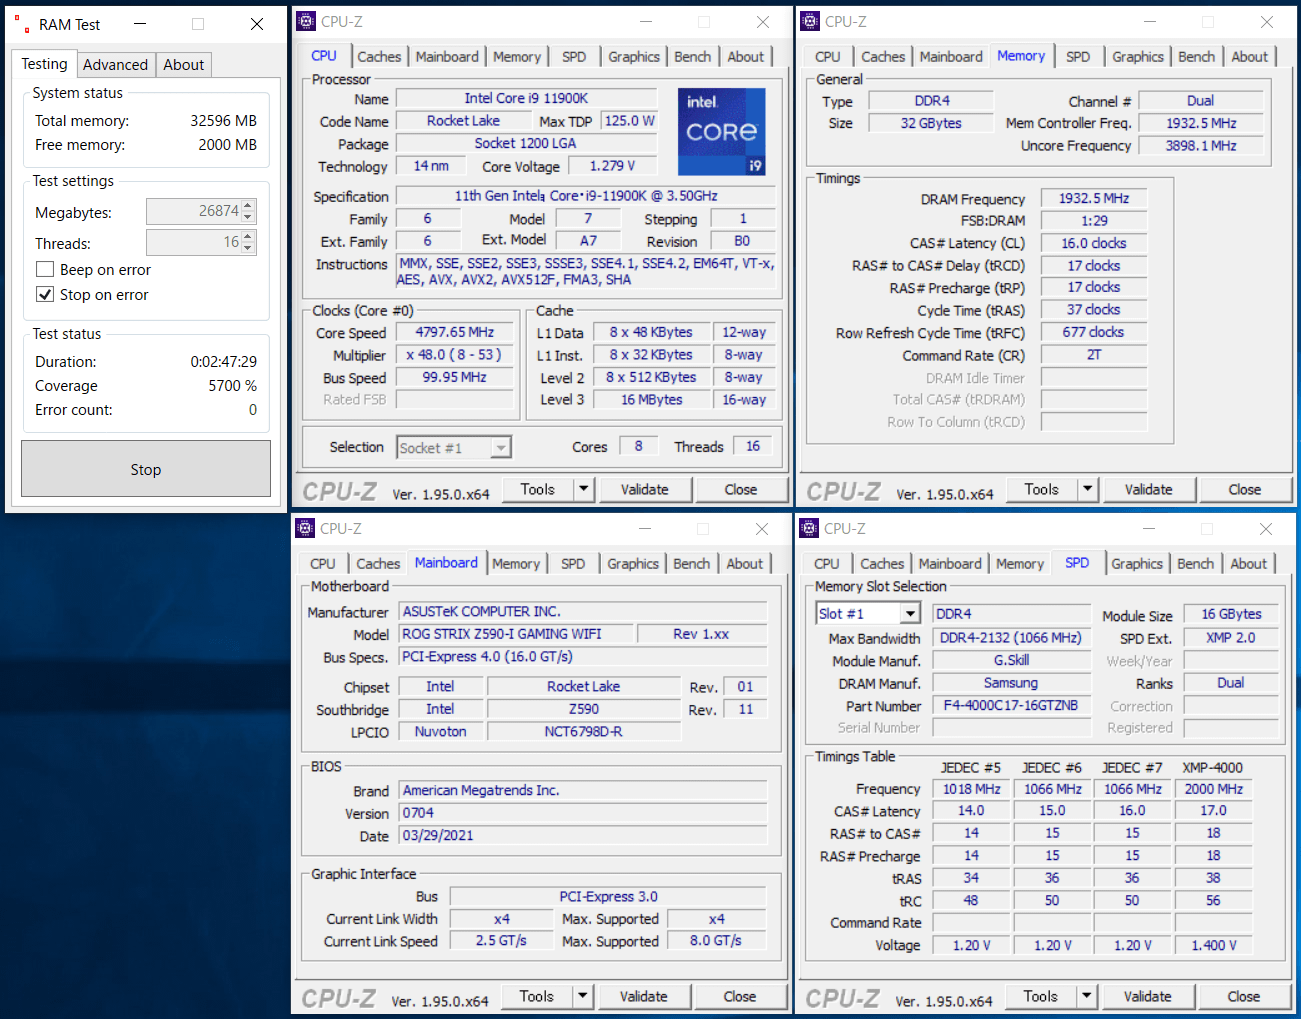 ASUS ROG STRIX Z590-I GAMING WIFI_11900K_memtest_3866_c16_g1